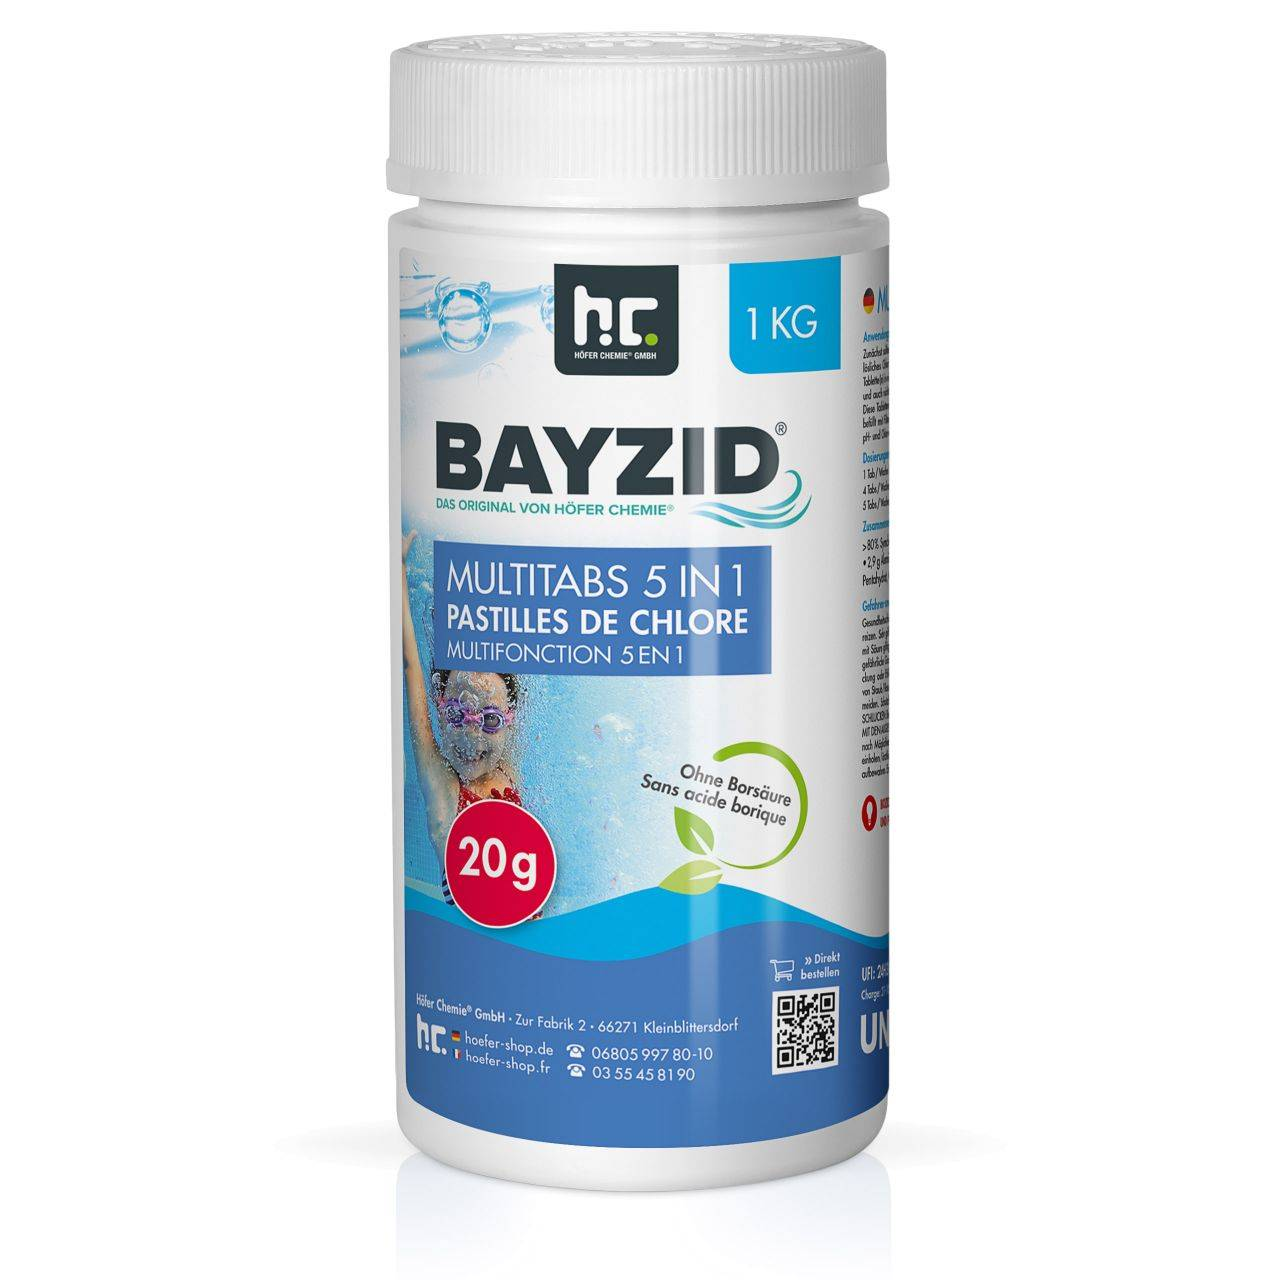 BAYZID 6 kg Bayzid® pastilles de chlore multifonction 20g 5 en 1 (6 x 1 kg)